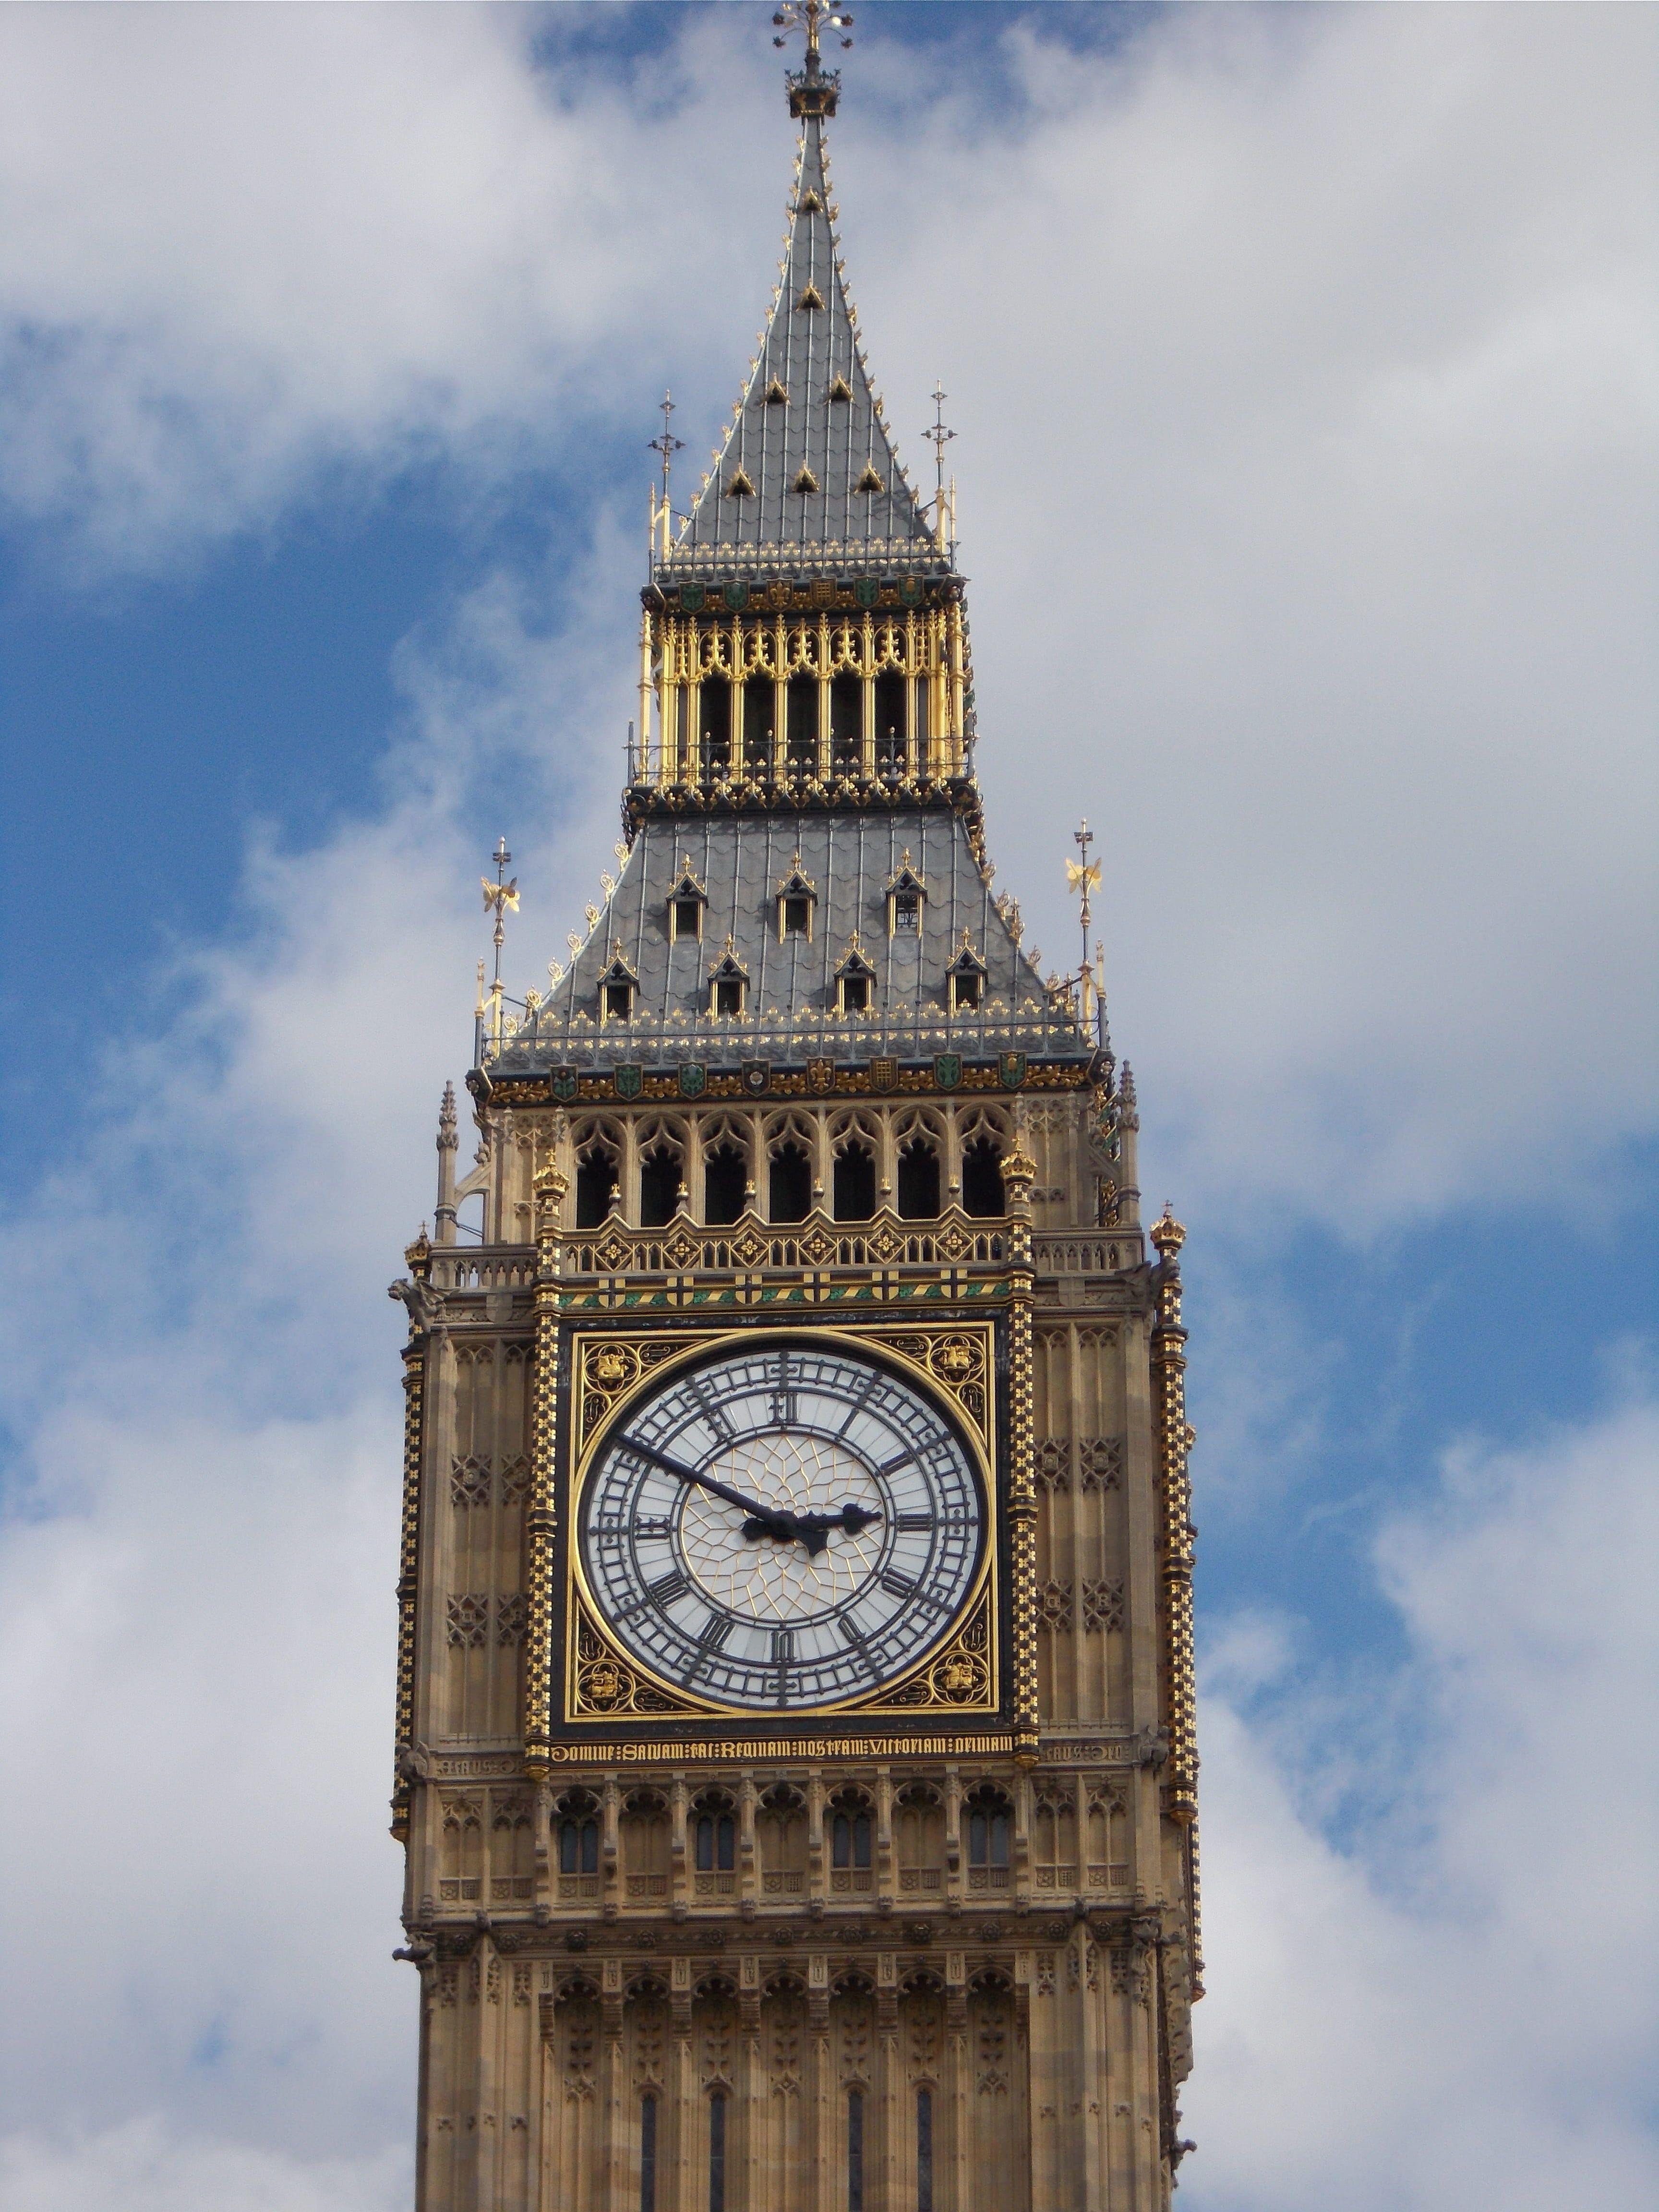 London Bigben Tower England Big Ben London England Clock Uk Houses Of Parliament London City Of Westminster Architecture Famous Place Clock Tower Eu